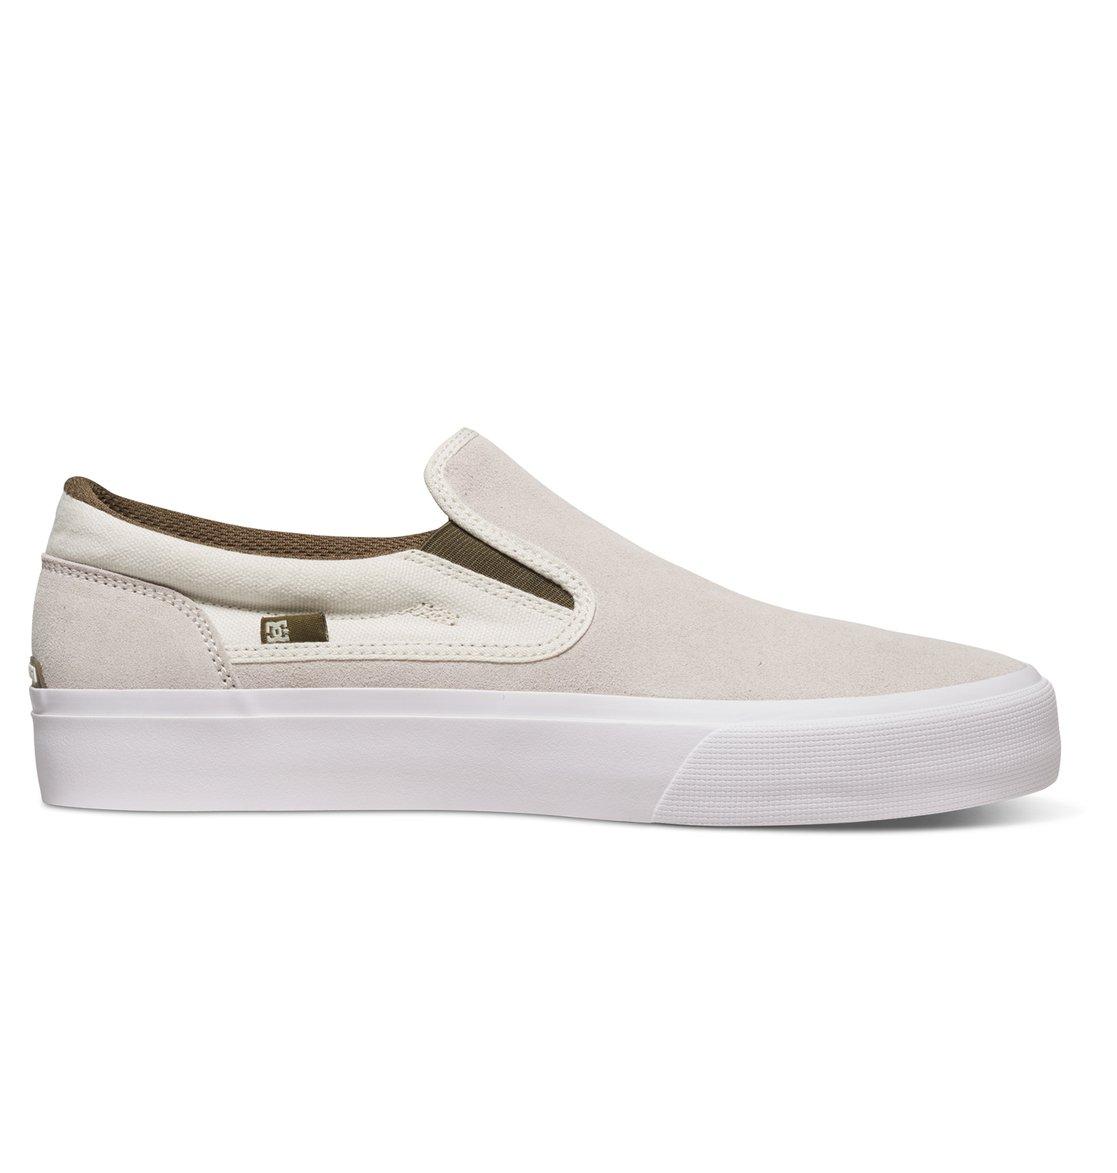 Skate Slip Trase On S Shoes Dc Adys300371 8qqwtrER5